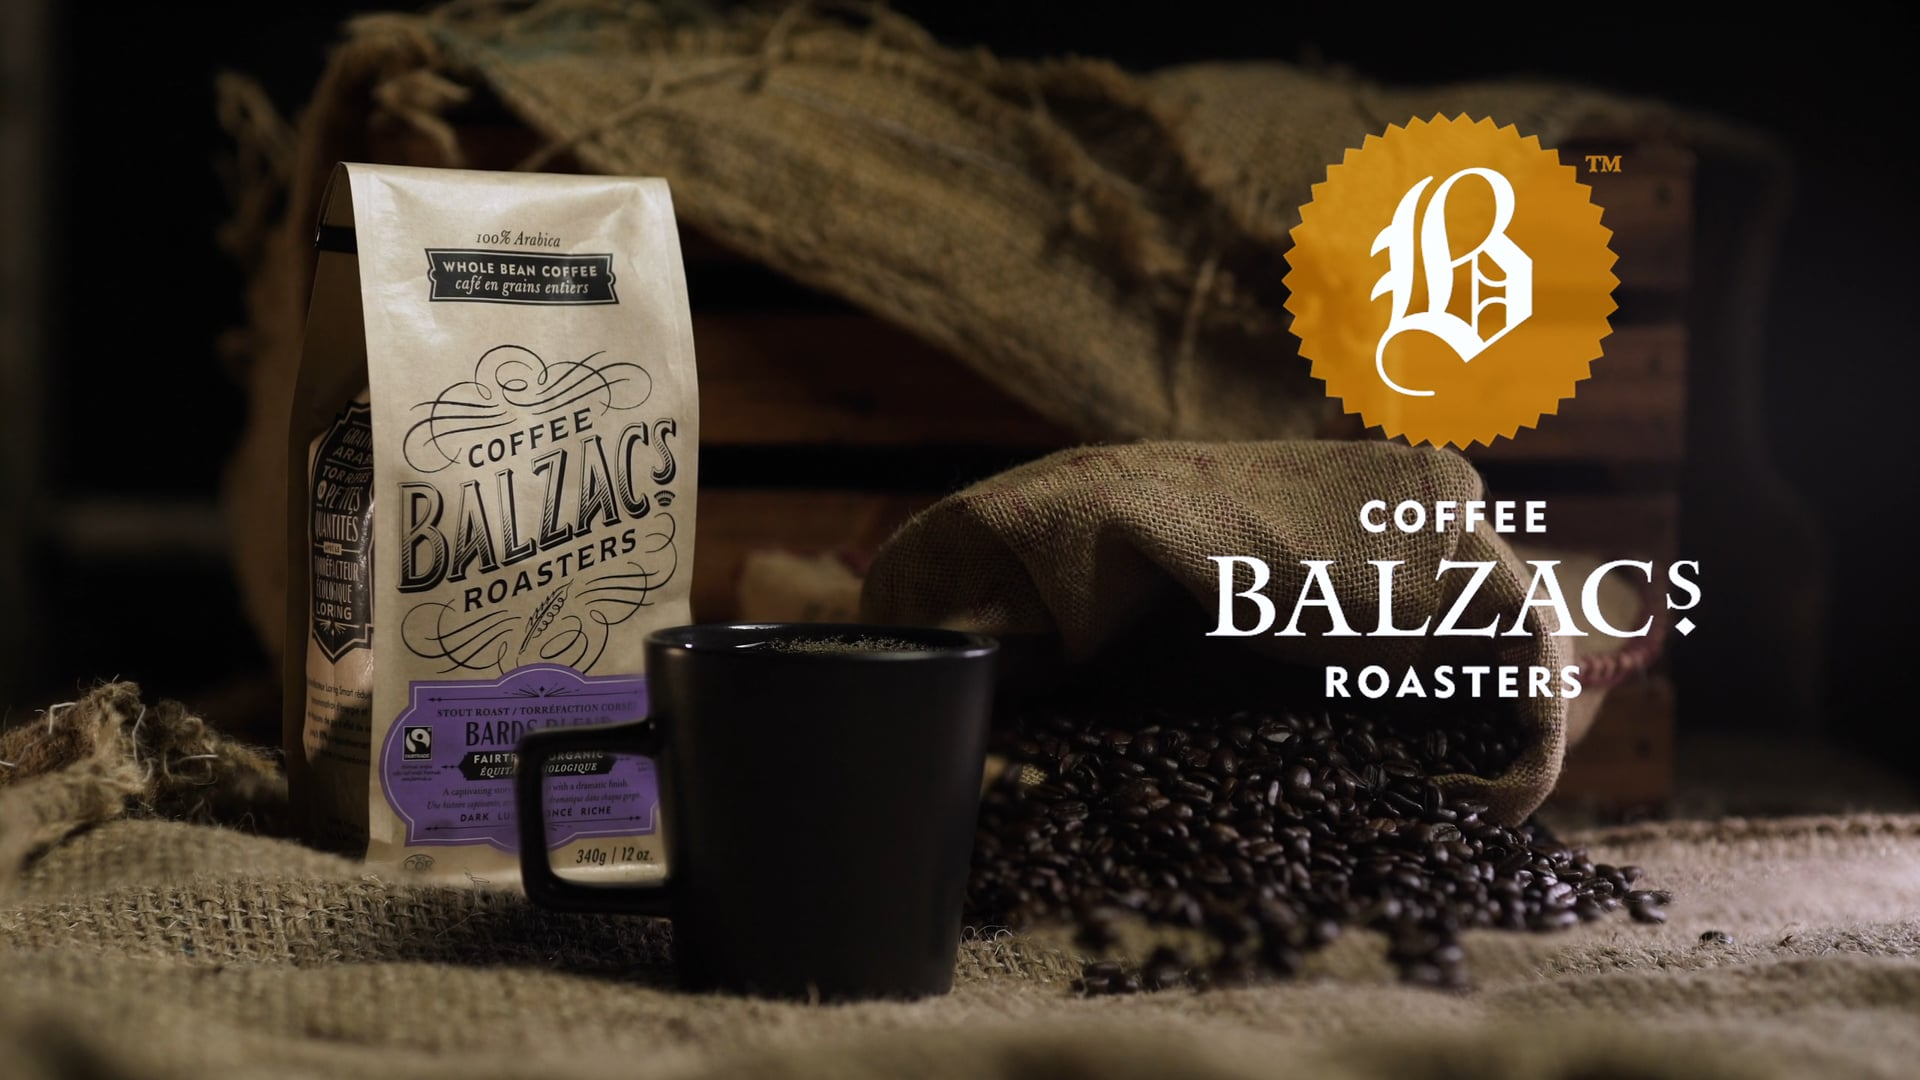 Balzac's Coffee Roasters (Commercial)